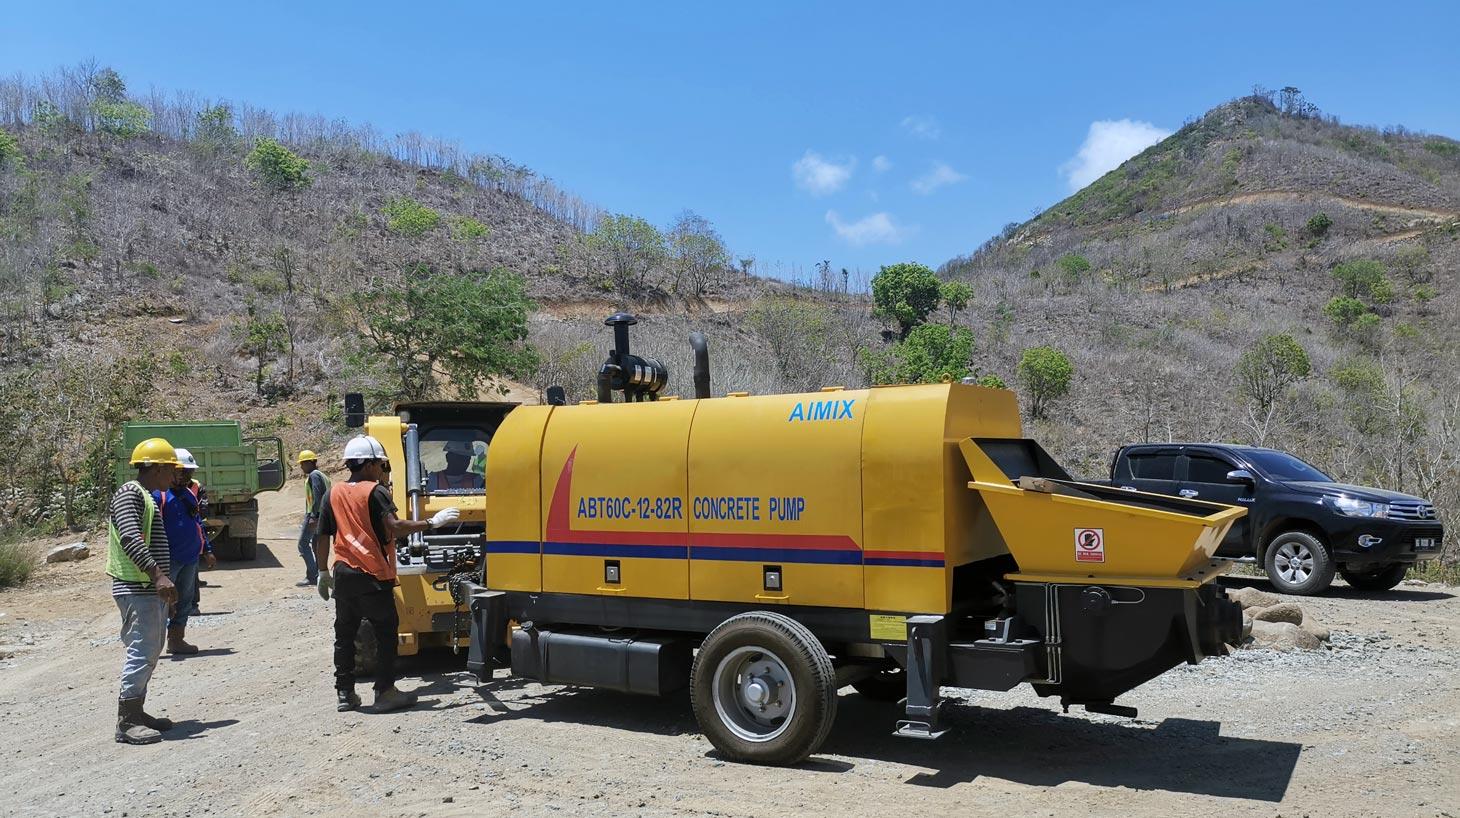 AIMIX concrete pump in Indonesia